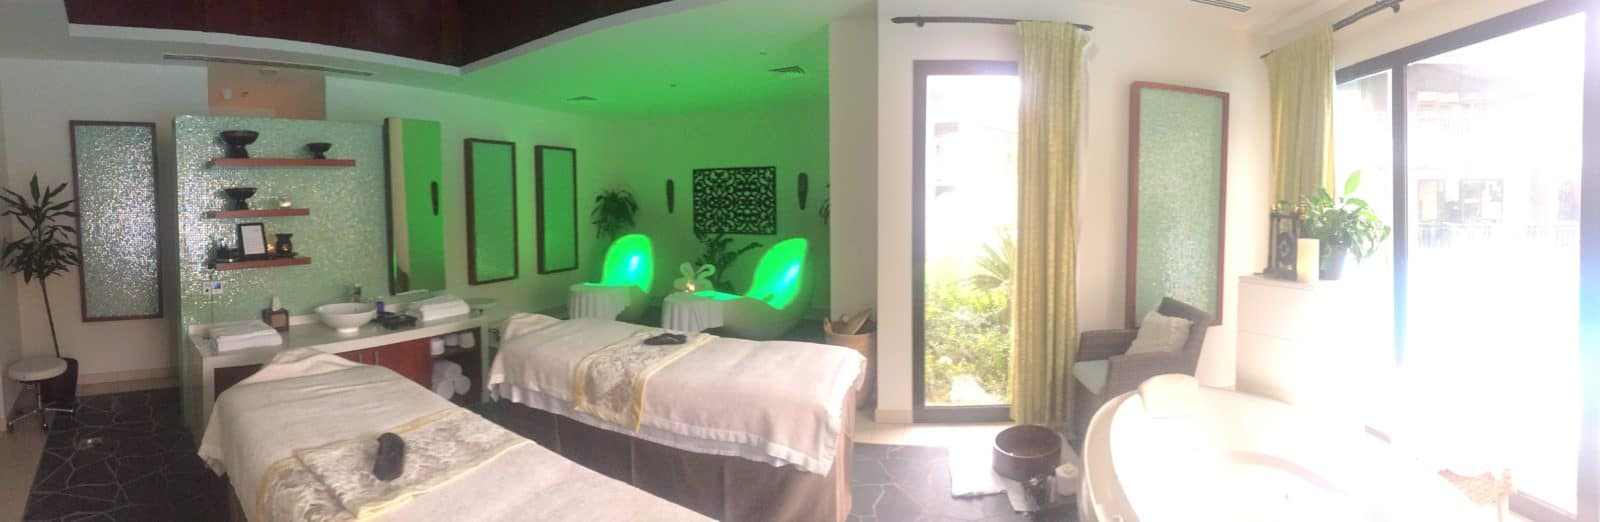 Reiseblogonline-Hotel-Anantara-Dubai-Spa-Wellness